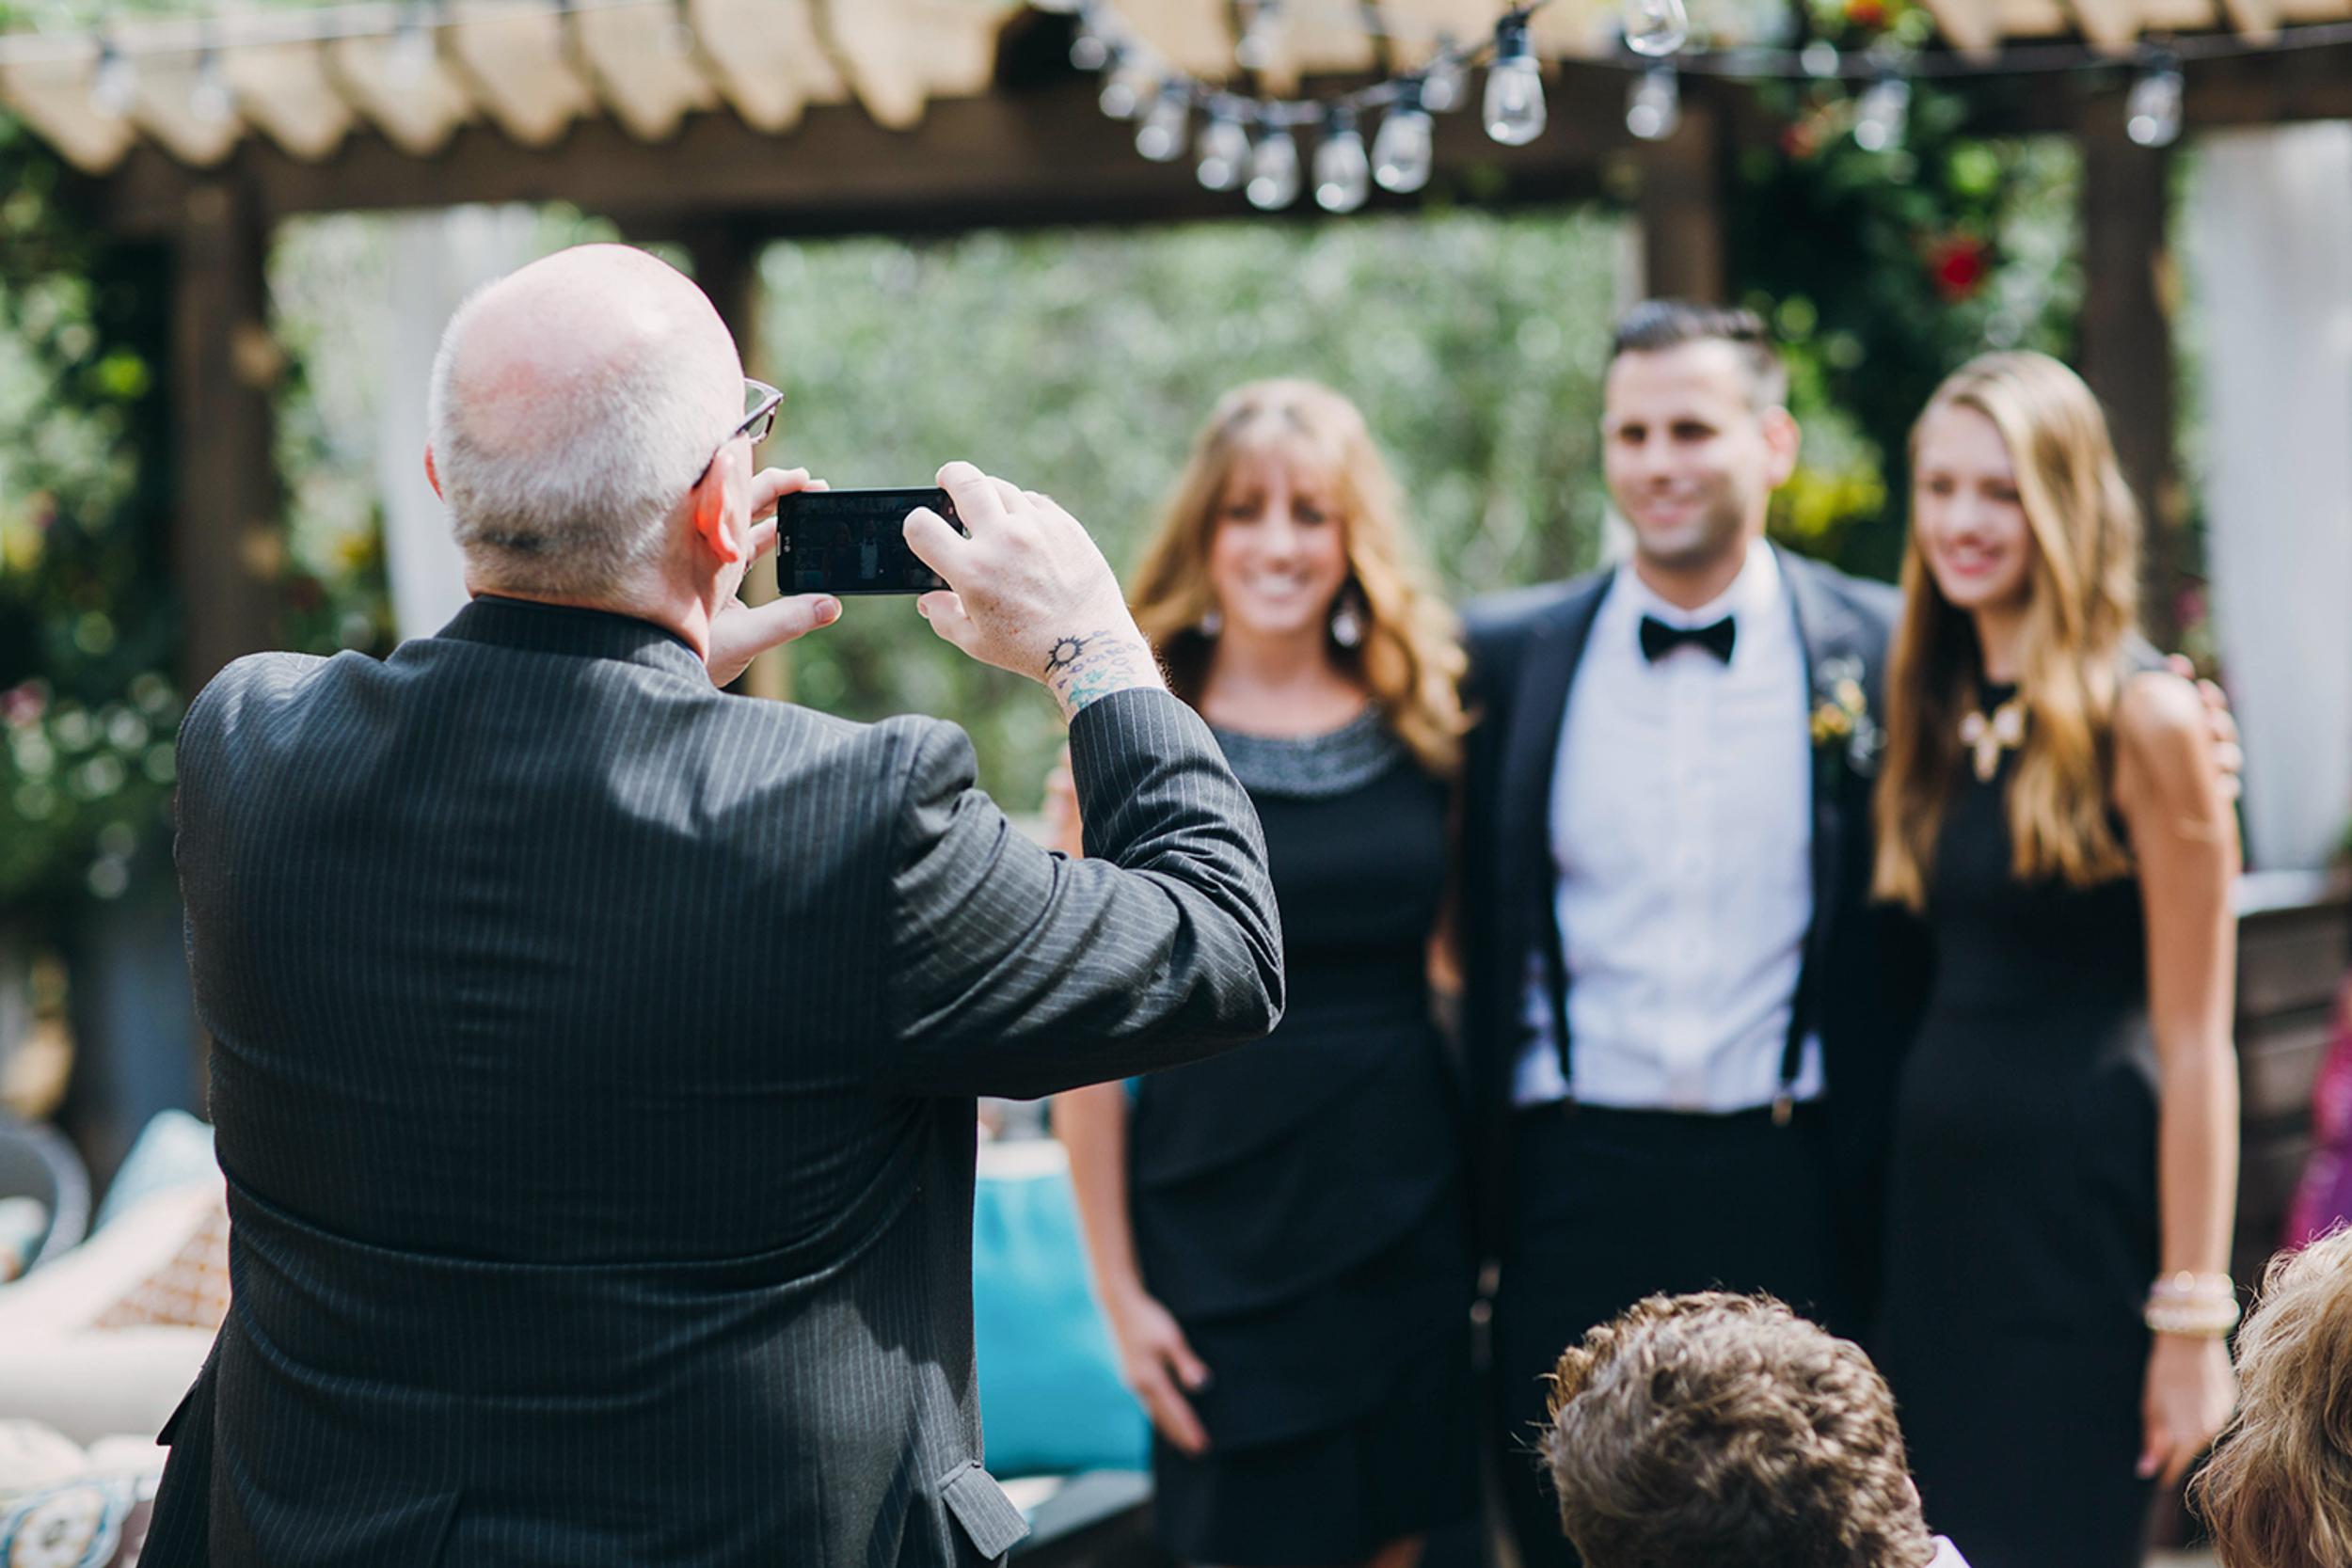 chicago.wedding.urban.intimate.zed451.lake.milton olive park-79.jpg